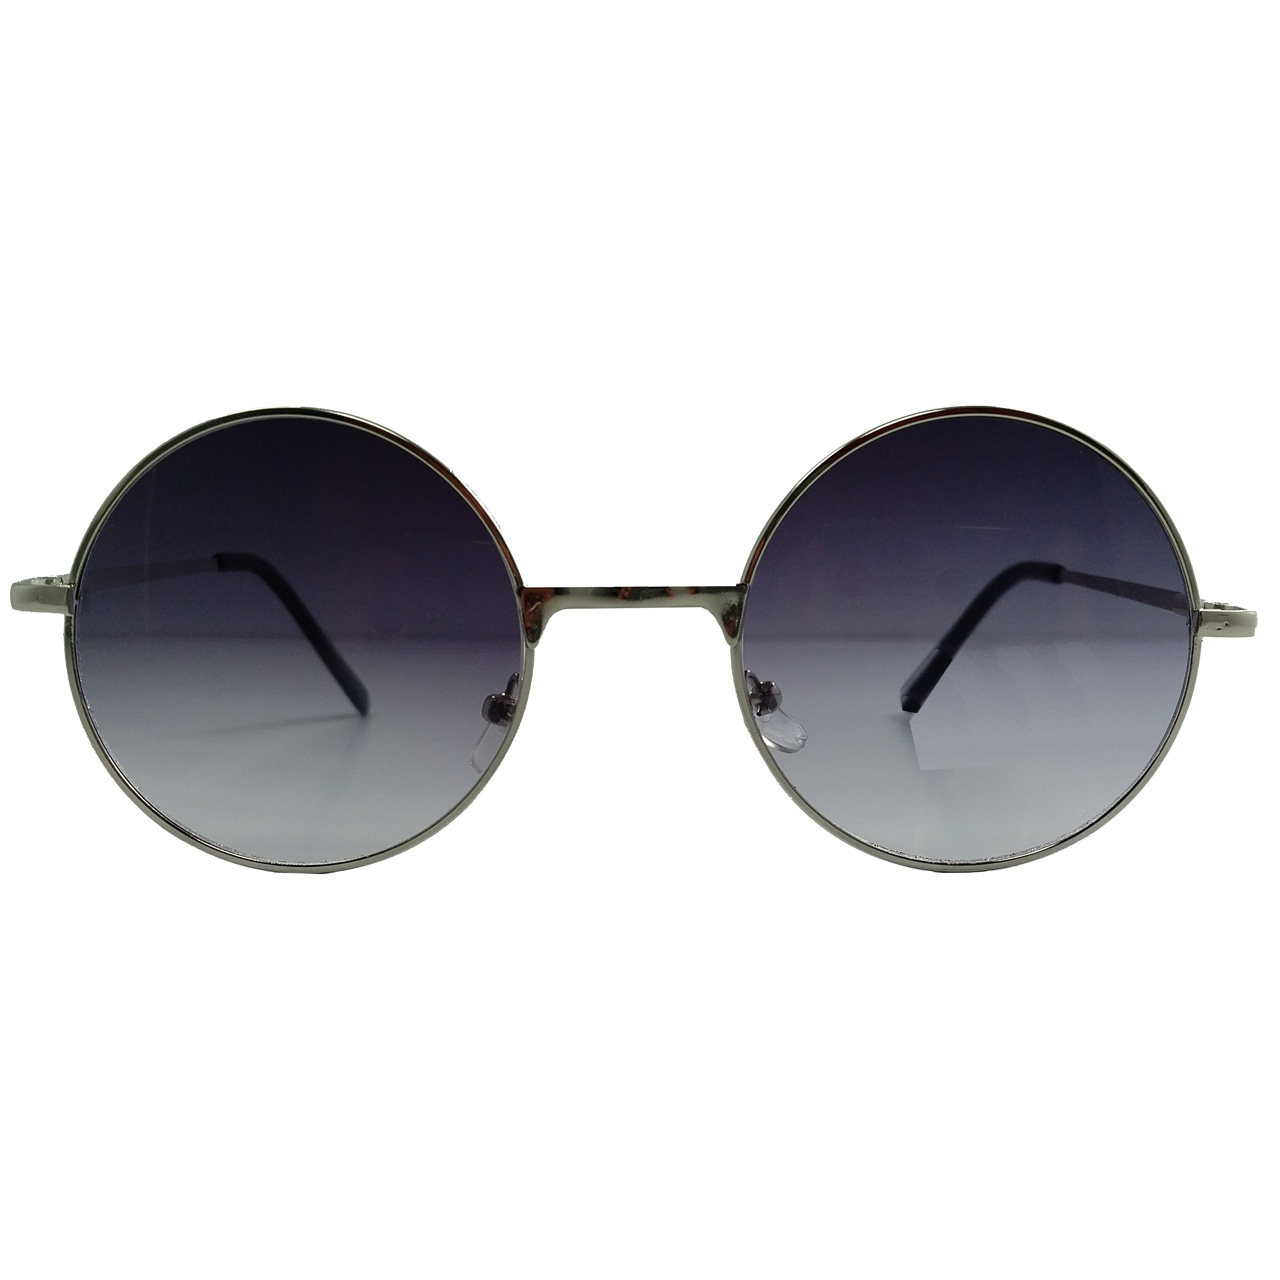 عینک آفتابی جان لنون مدل  JOHN LENNON BLACK